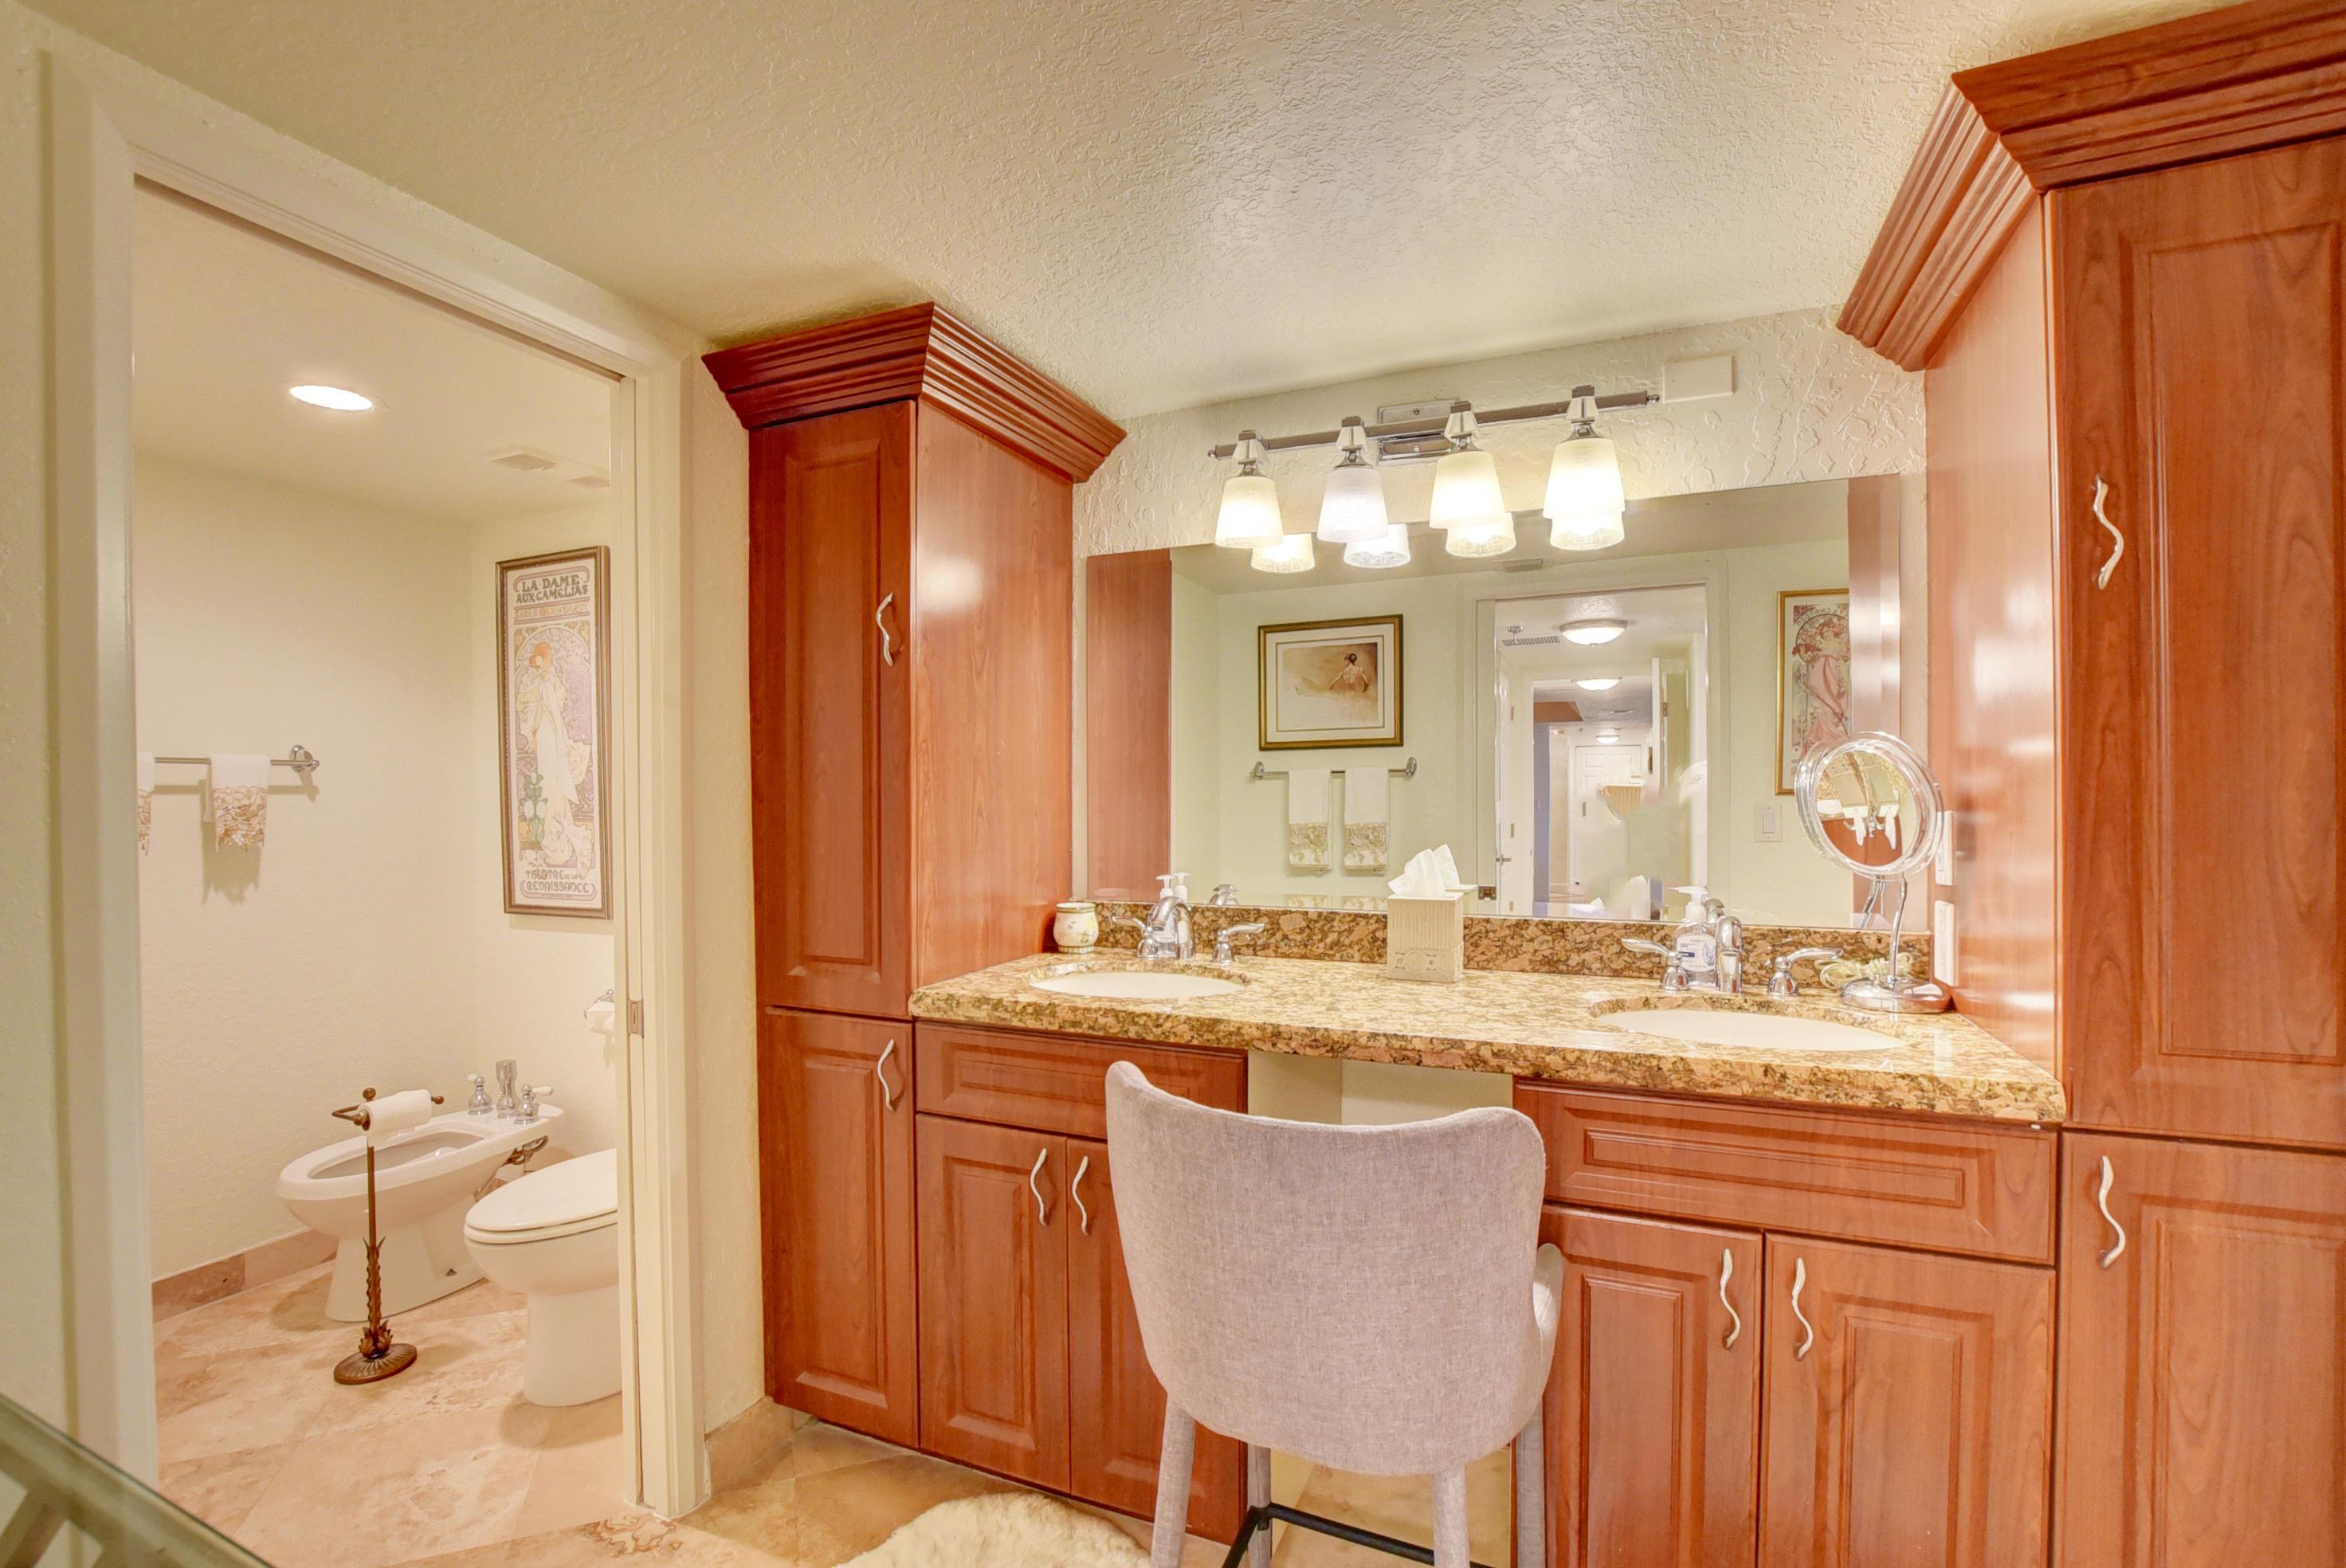 20080 Boca West Drive, Boca Raton, Florida 33434, 2 Bedrooms Bedrooms, ,2 BathroomsBathrooms,Residential,For Sale,Boca West,RX-10678058